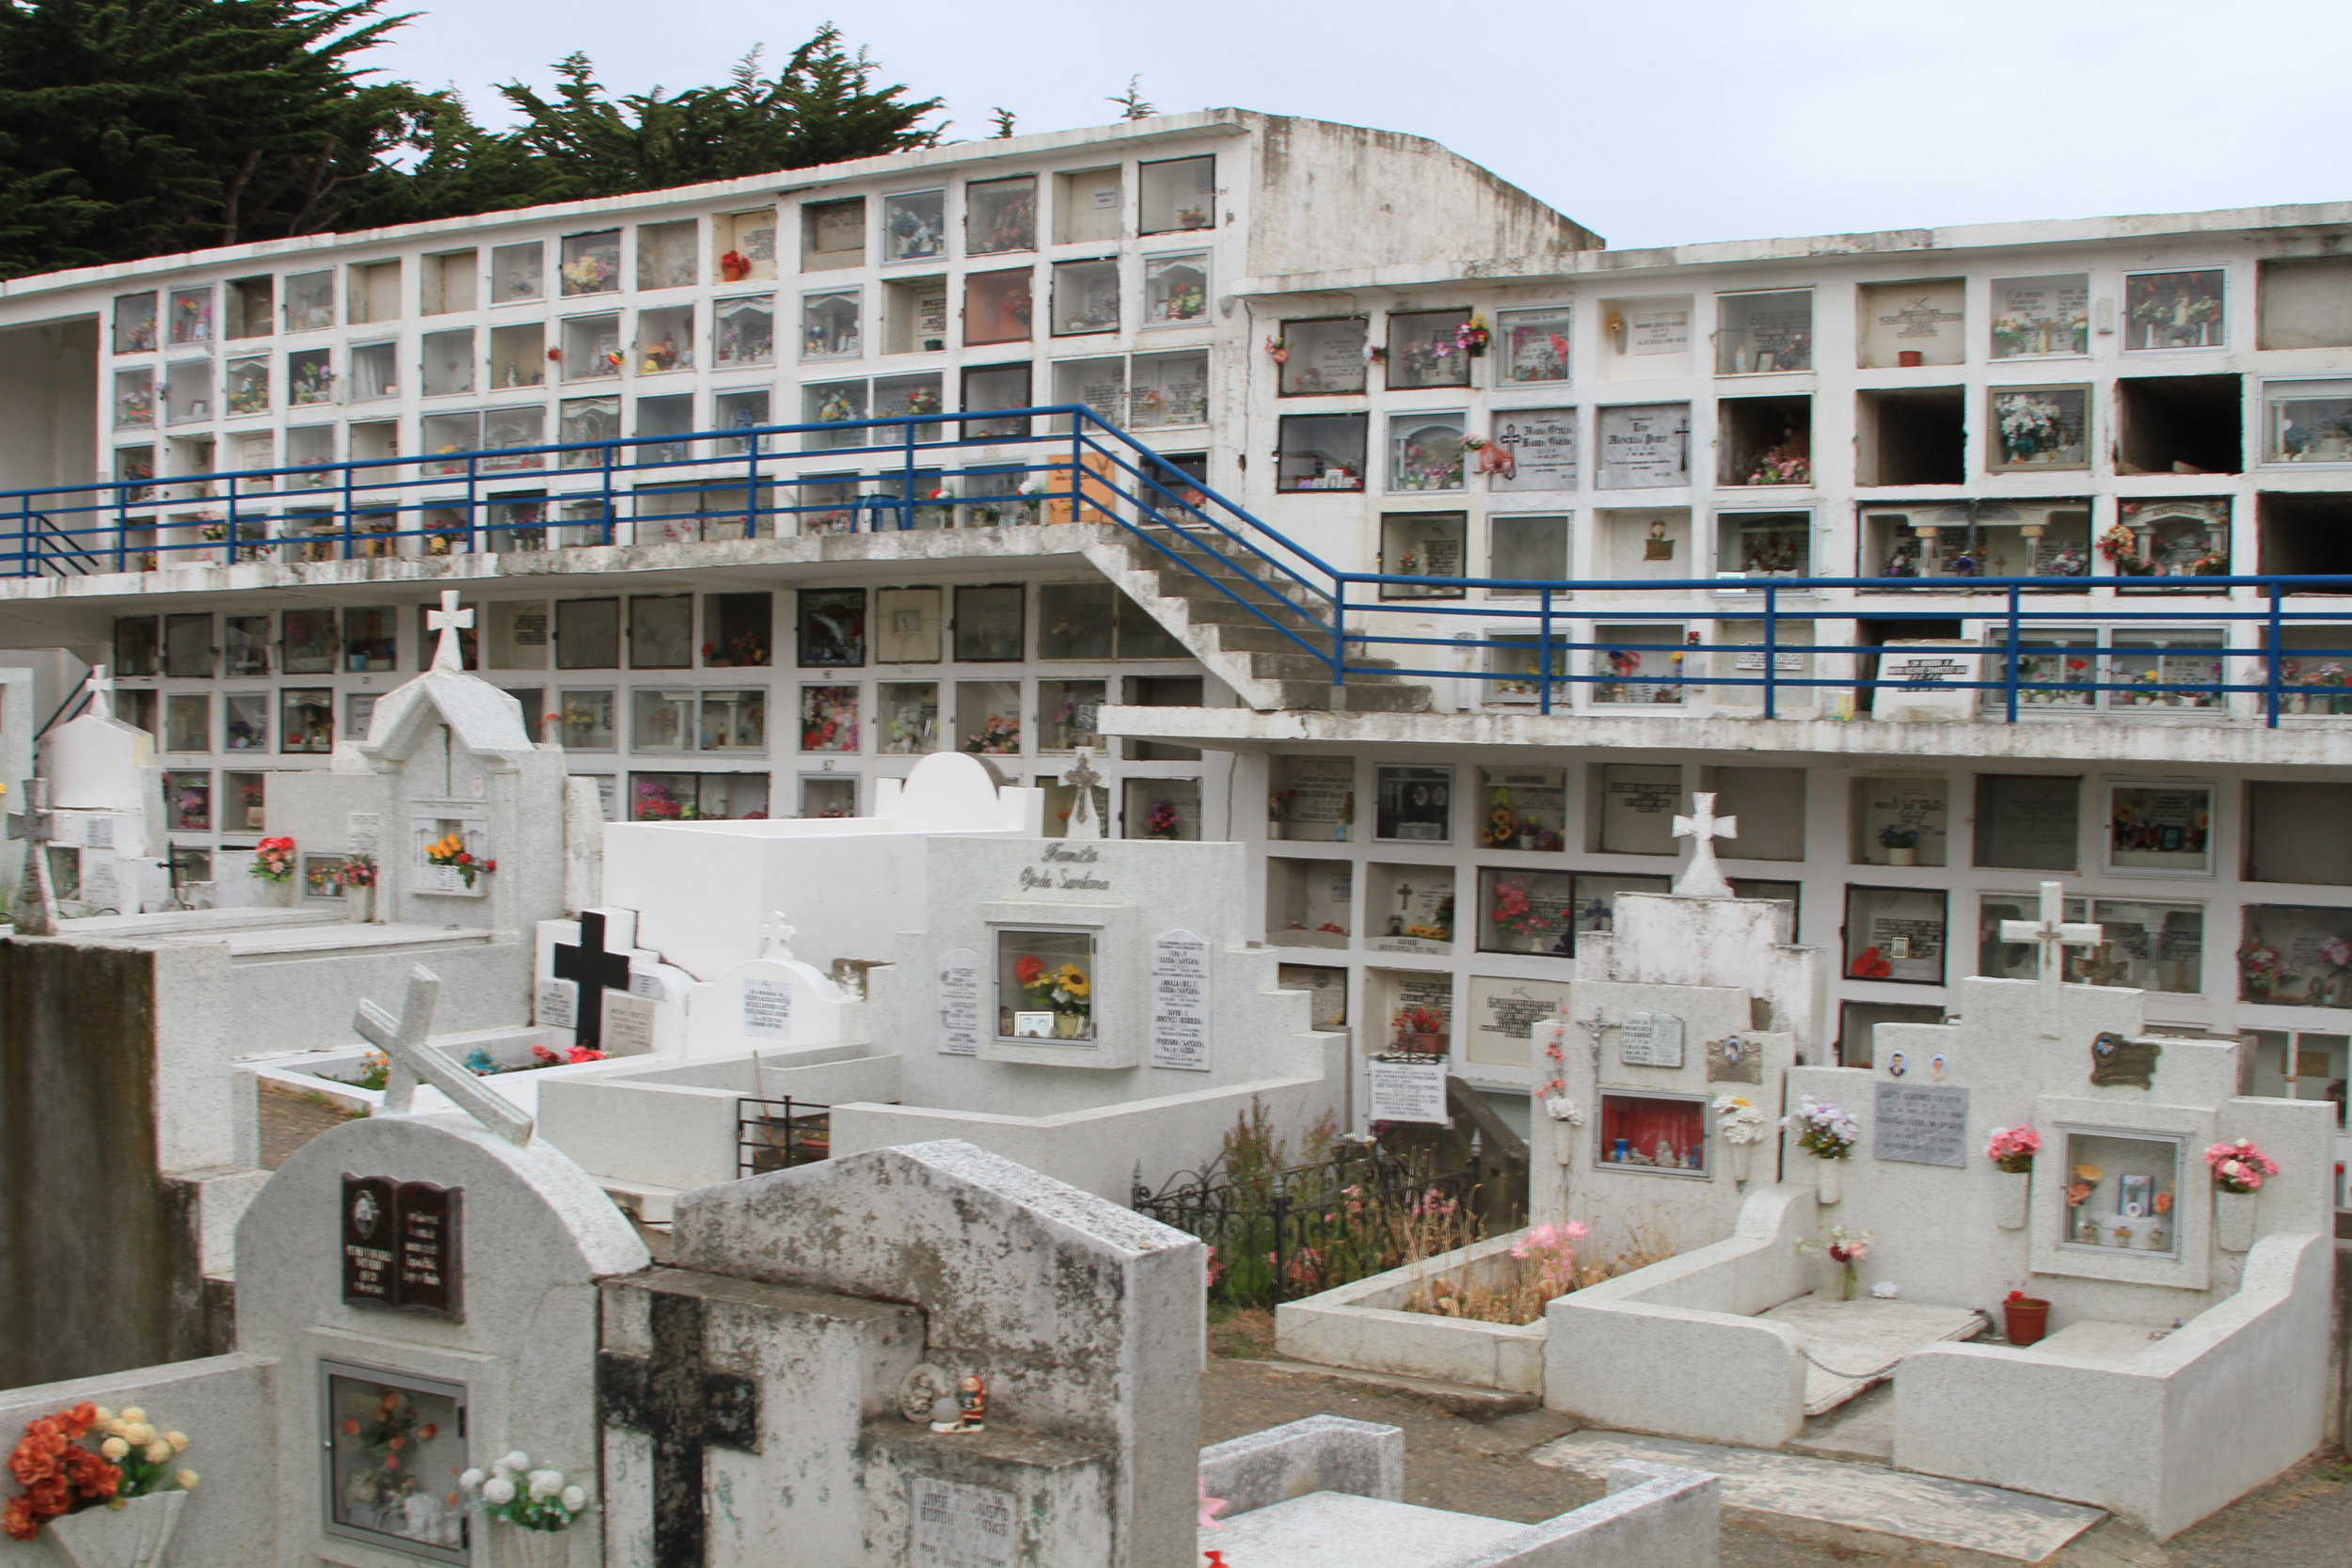 cemetario municipal of punta arenas, chile